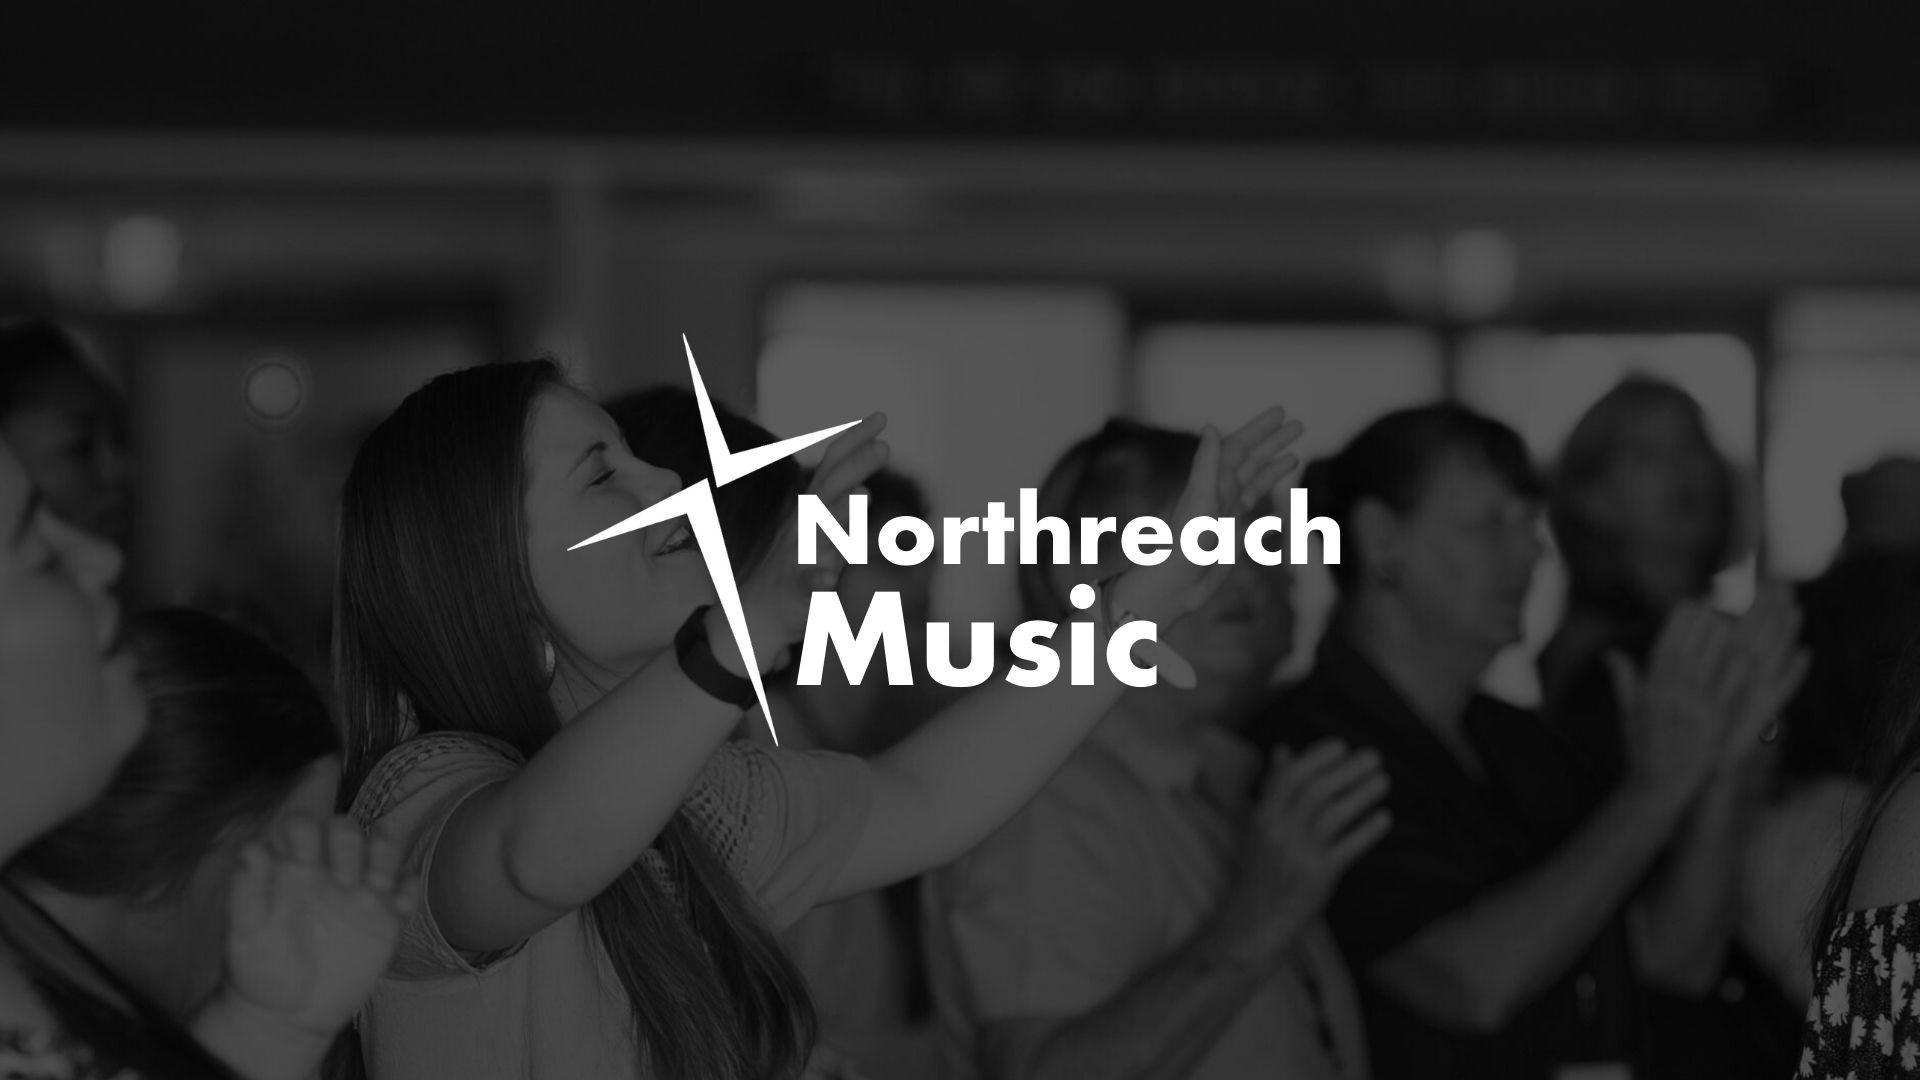 Northreach Music